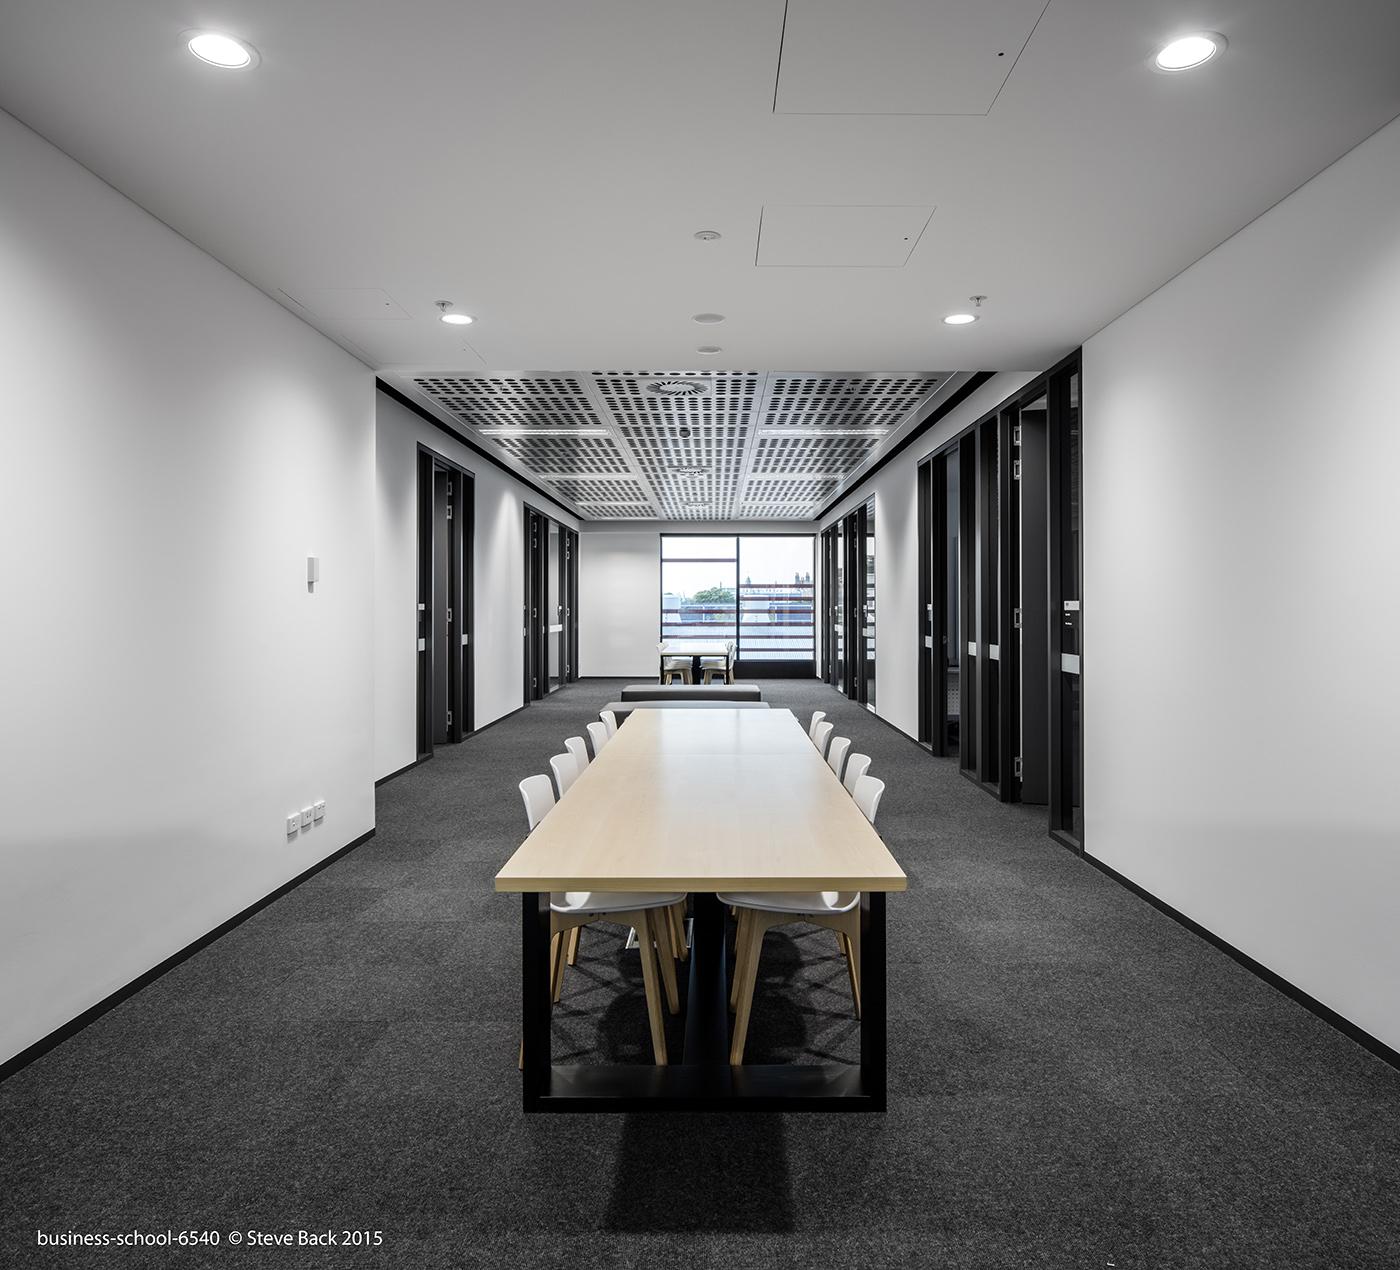 business-school-6540.jpg